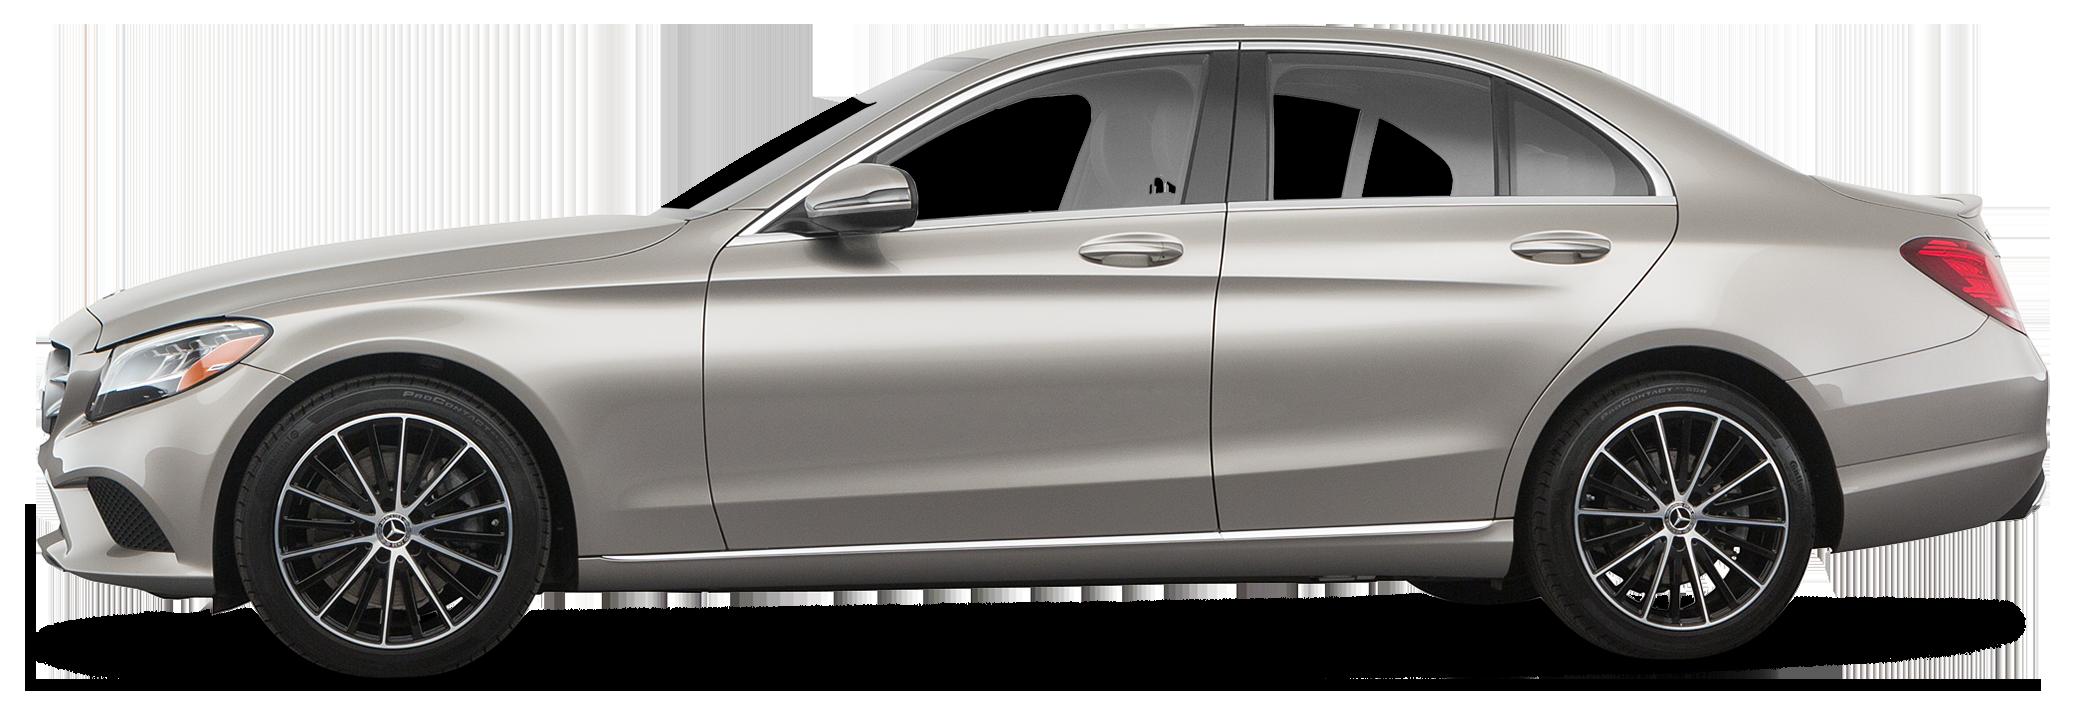 2020 Mercedes-Benz C-Class Sedan C 300